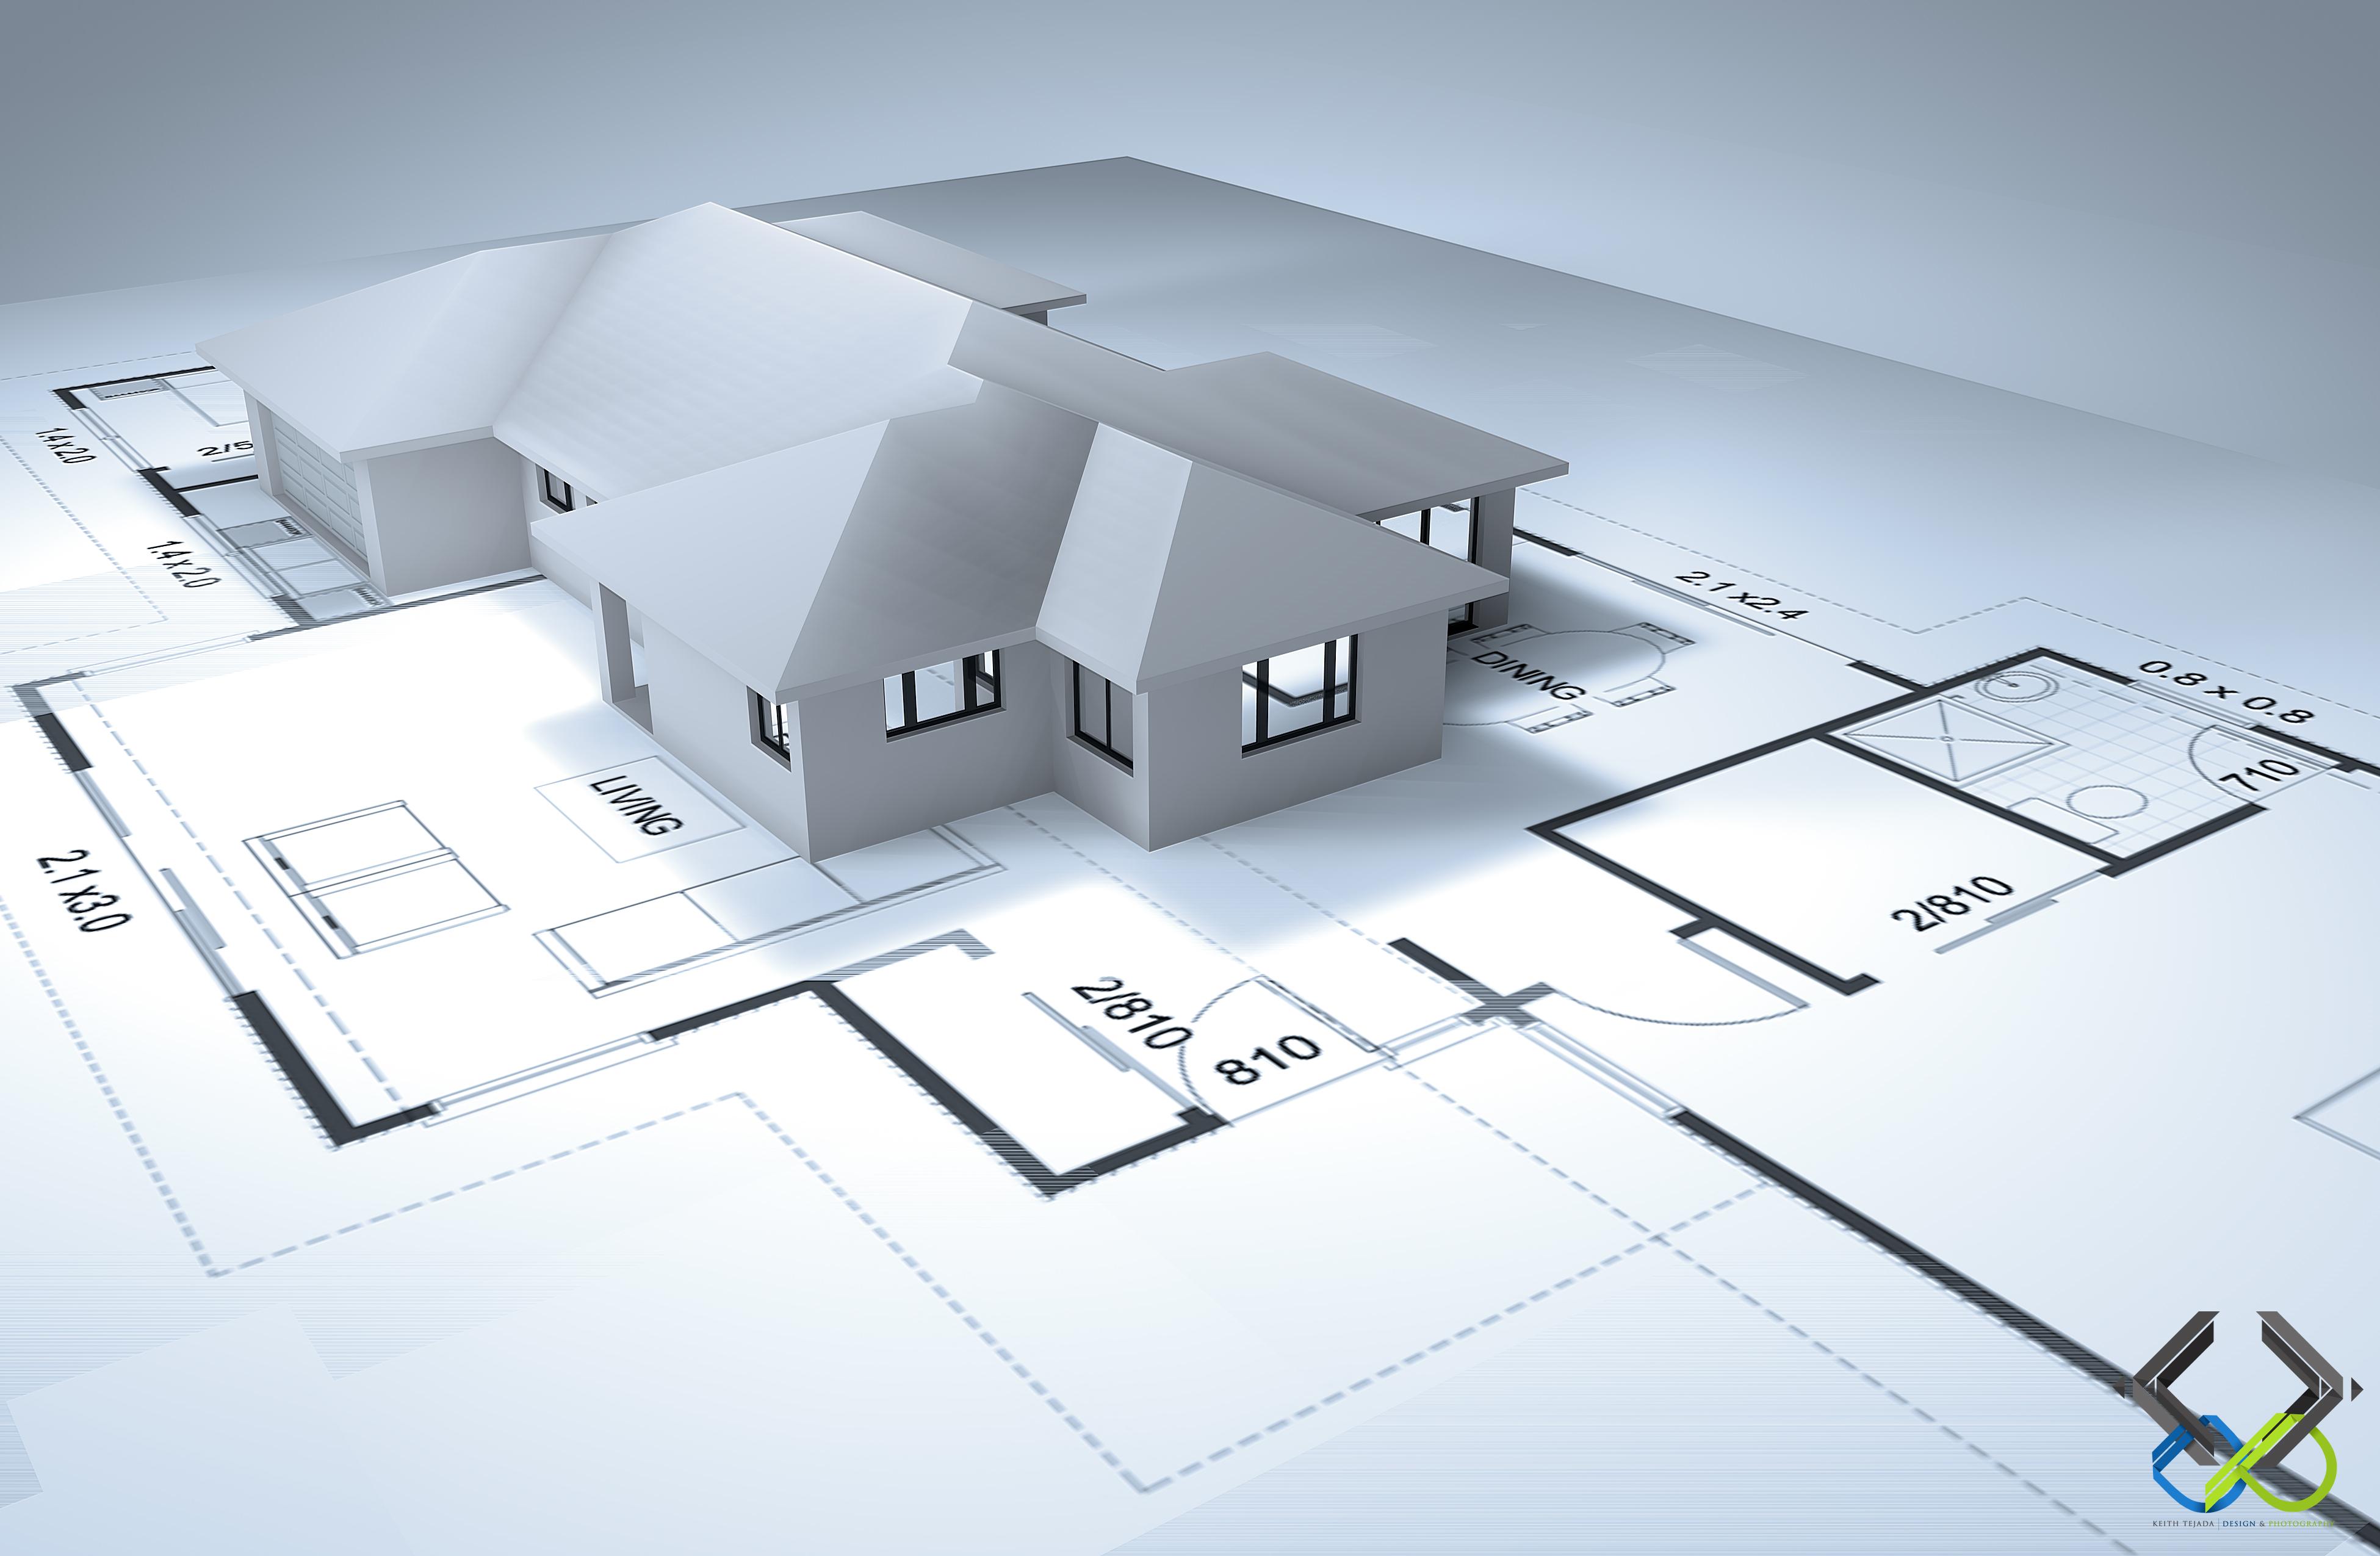 3d house model 5 by ktedz on deviantart 3d house model 5 by ktedz ccuart Image collections